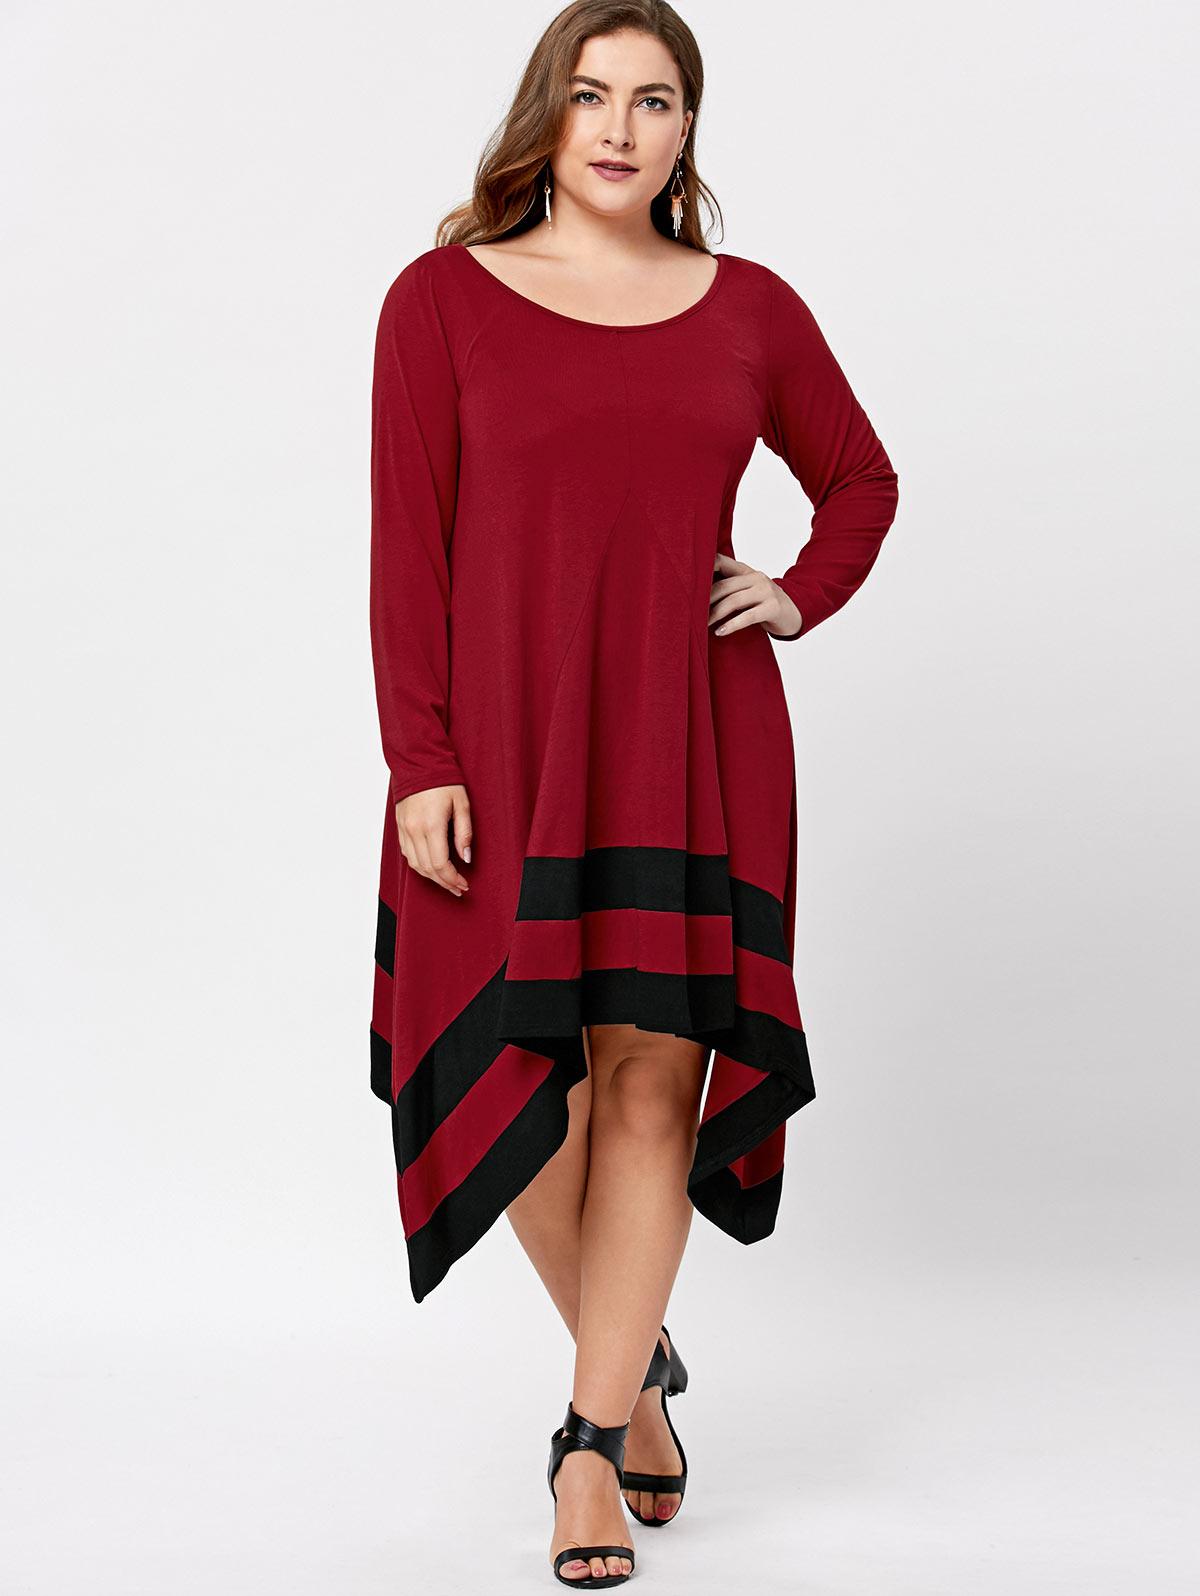 Casual Style Autumn Women Mid Calf Dress solid color Long Sleeve Asymmetric party outwear Dress vestidos Plus Size XL-5XL